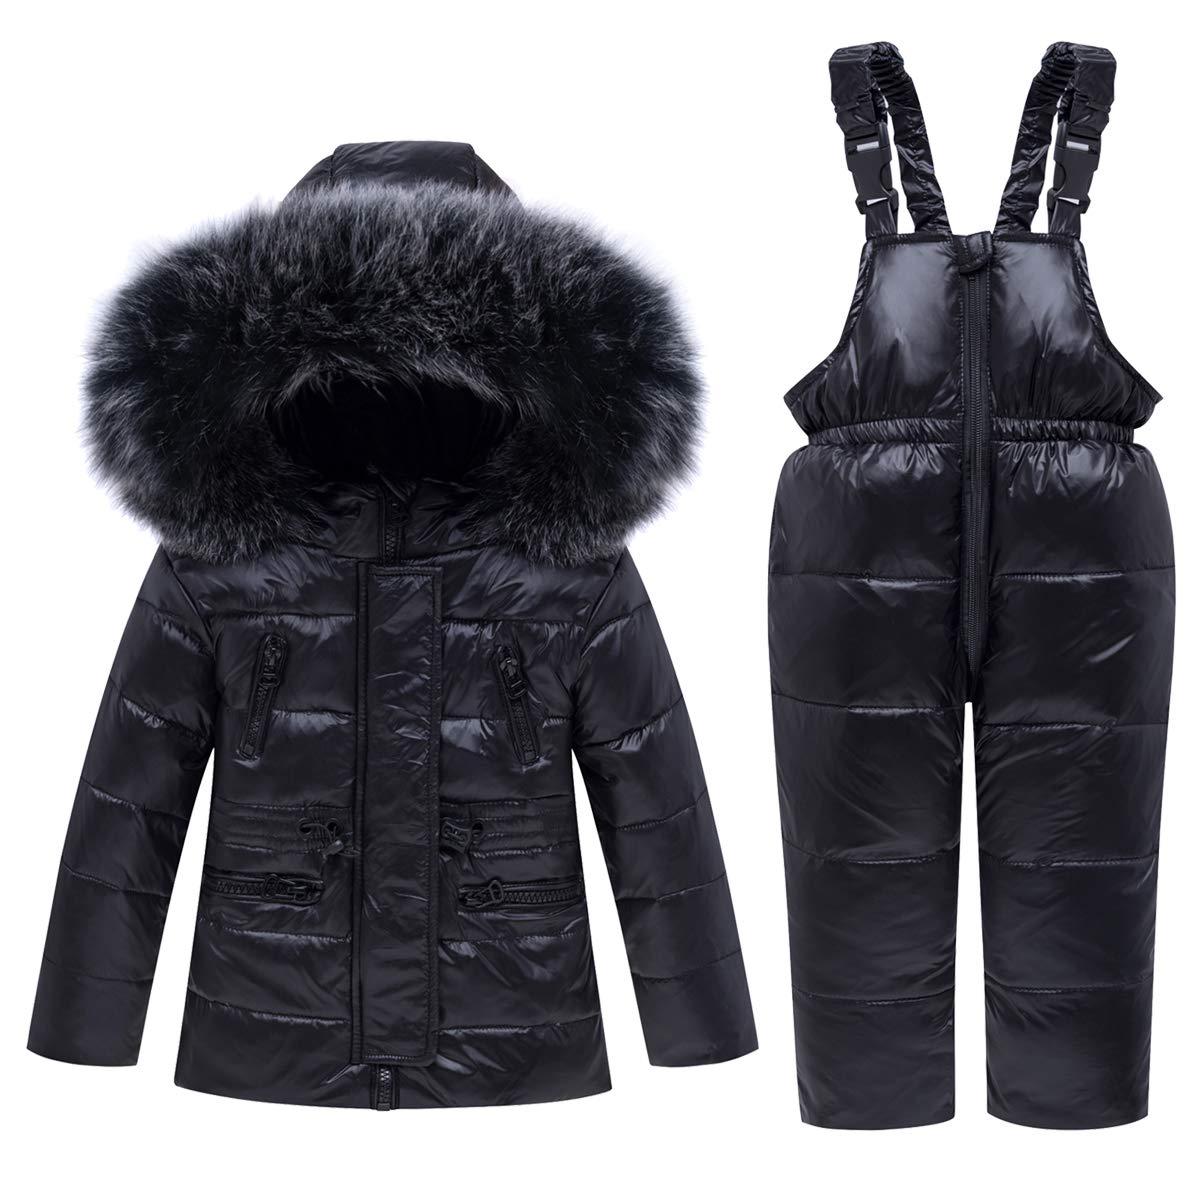 Kids Ski Suits 2-Piece Snowsuit Set Winter Hooded Puffer Jacket + Snow Bib Pants Ultralight Skisuit Set, Black 18-24 Months by JiAmy